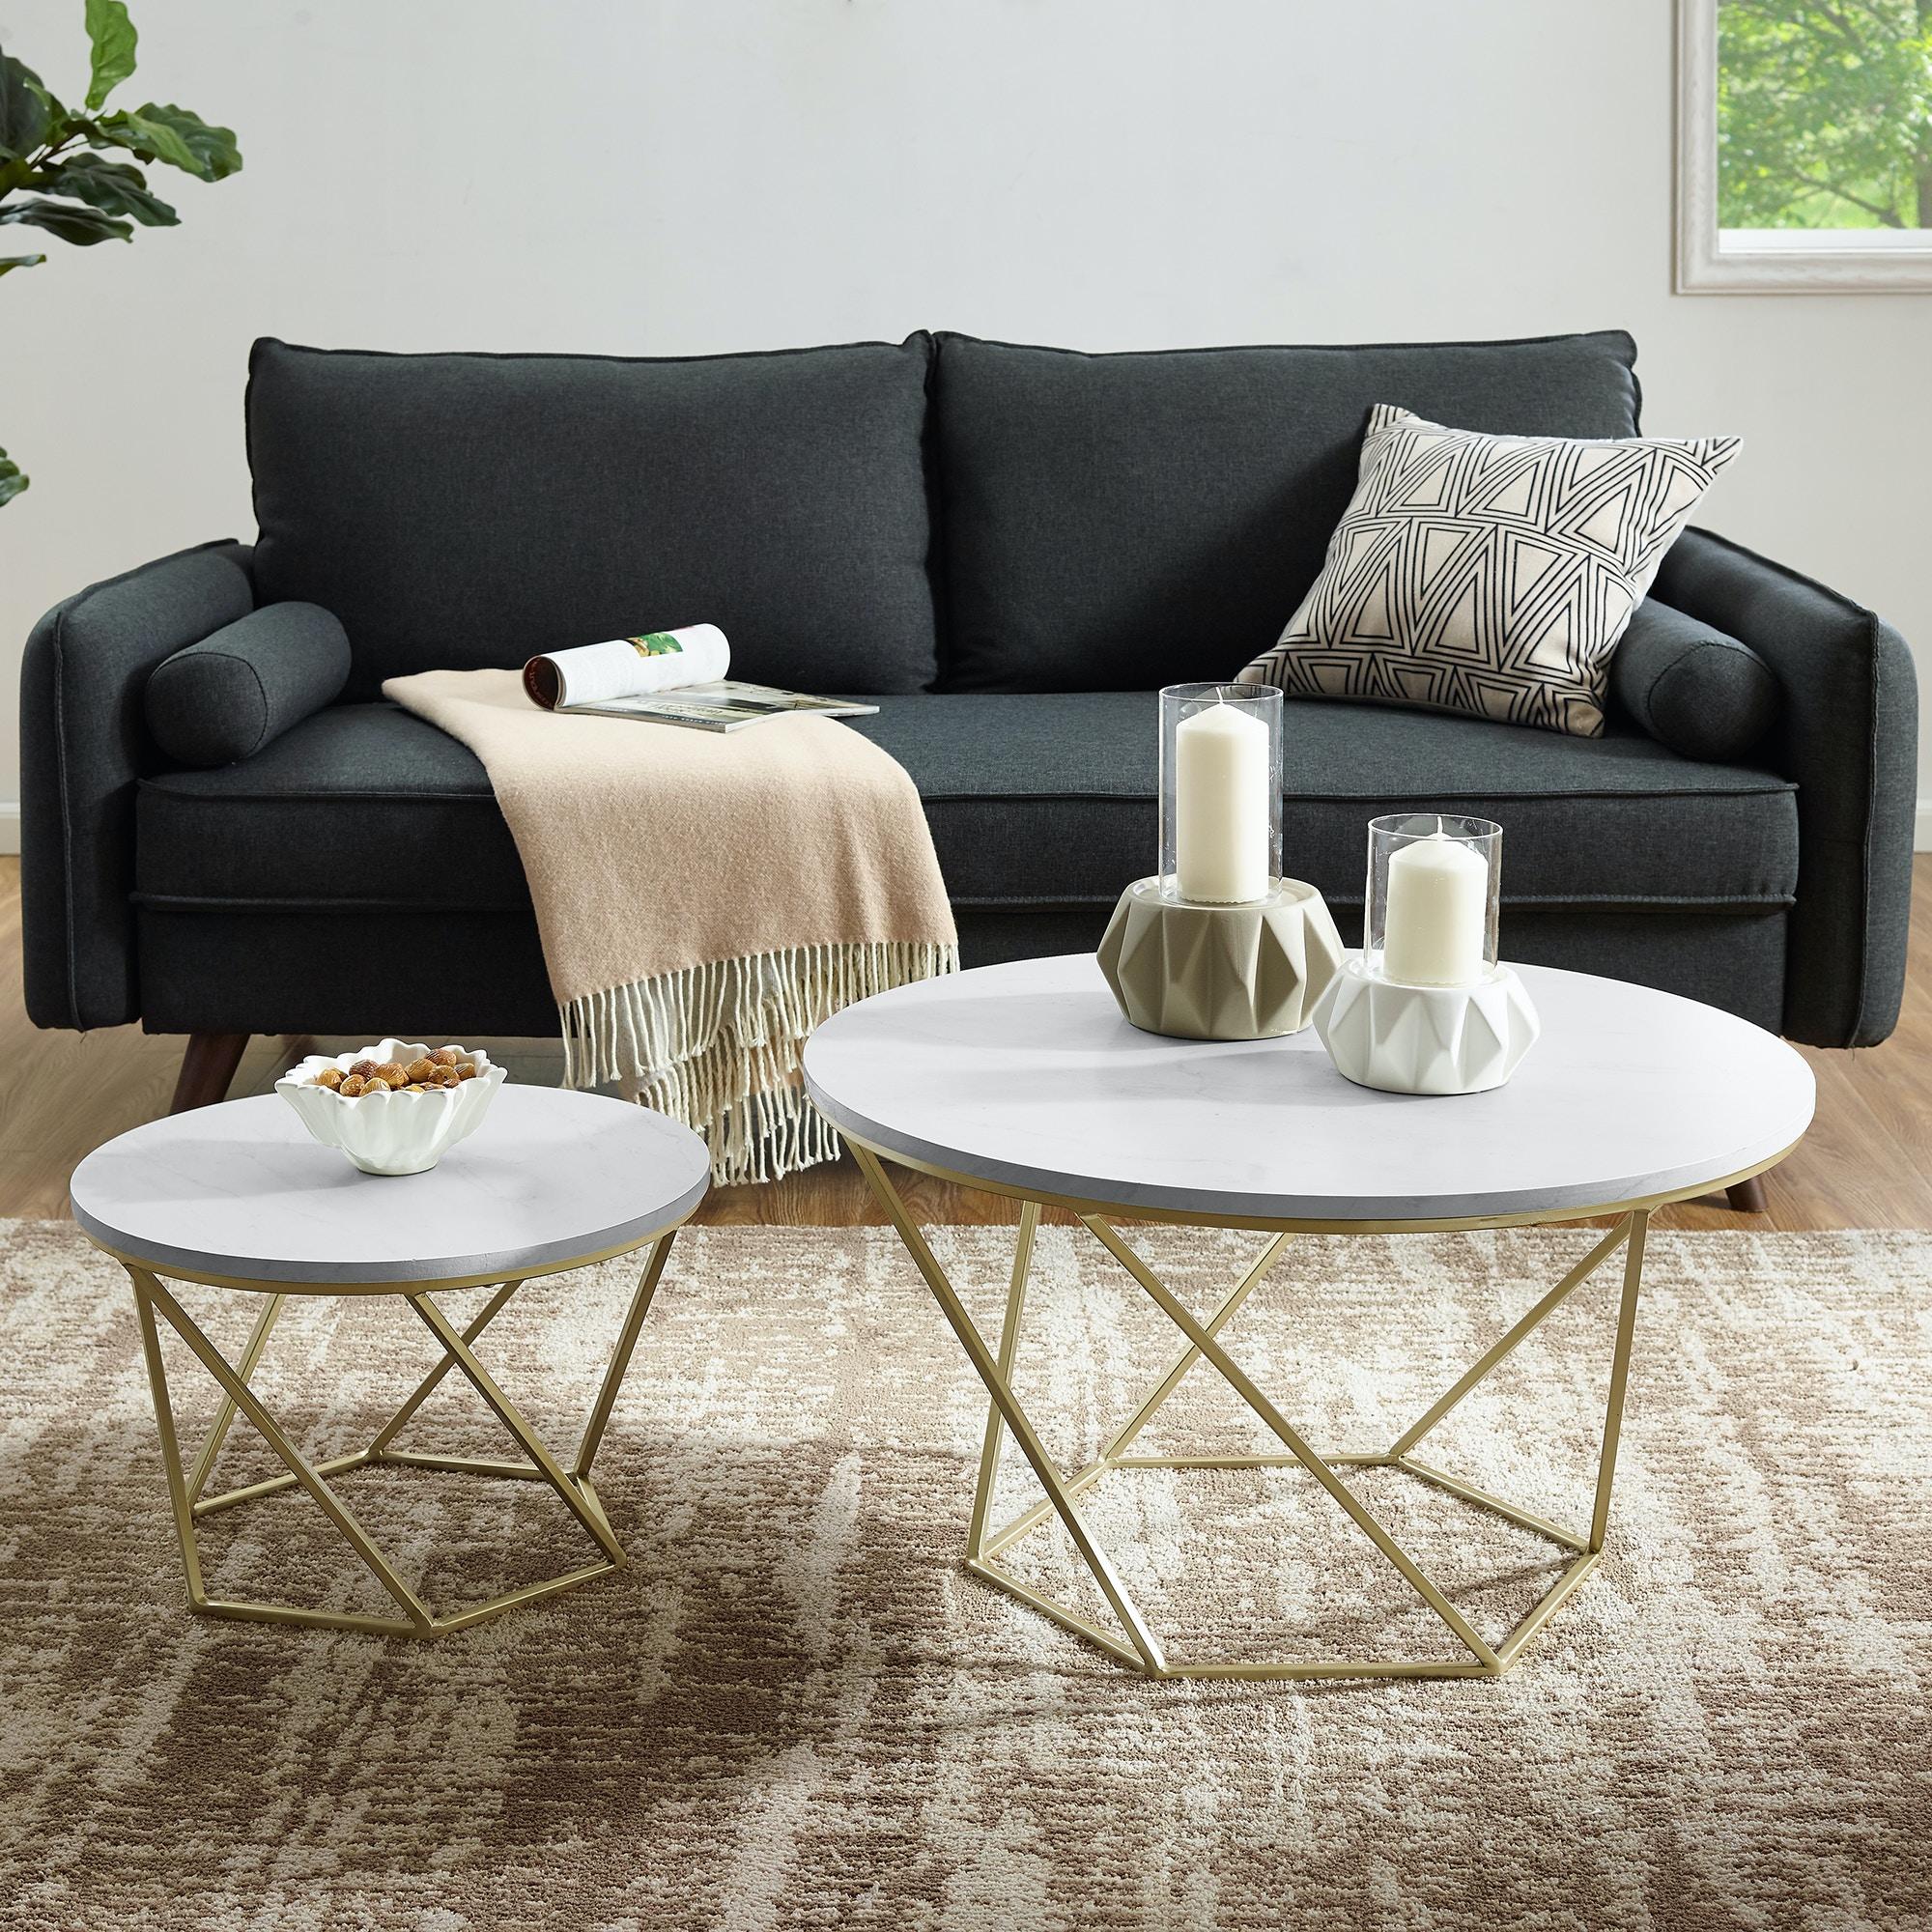 Charmant Ft Myers Modern Bohemian Geometric Glass Nesting Coffee Table Set   White  Marble/Gold WEDAF28CLRGMG